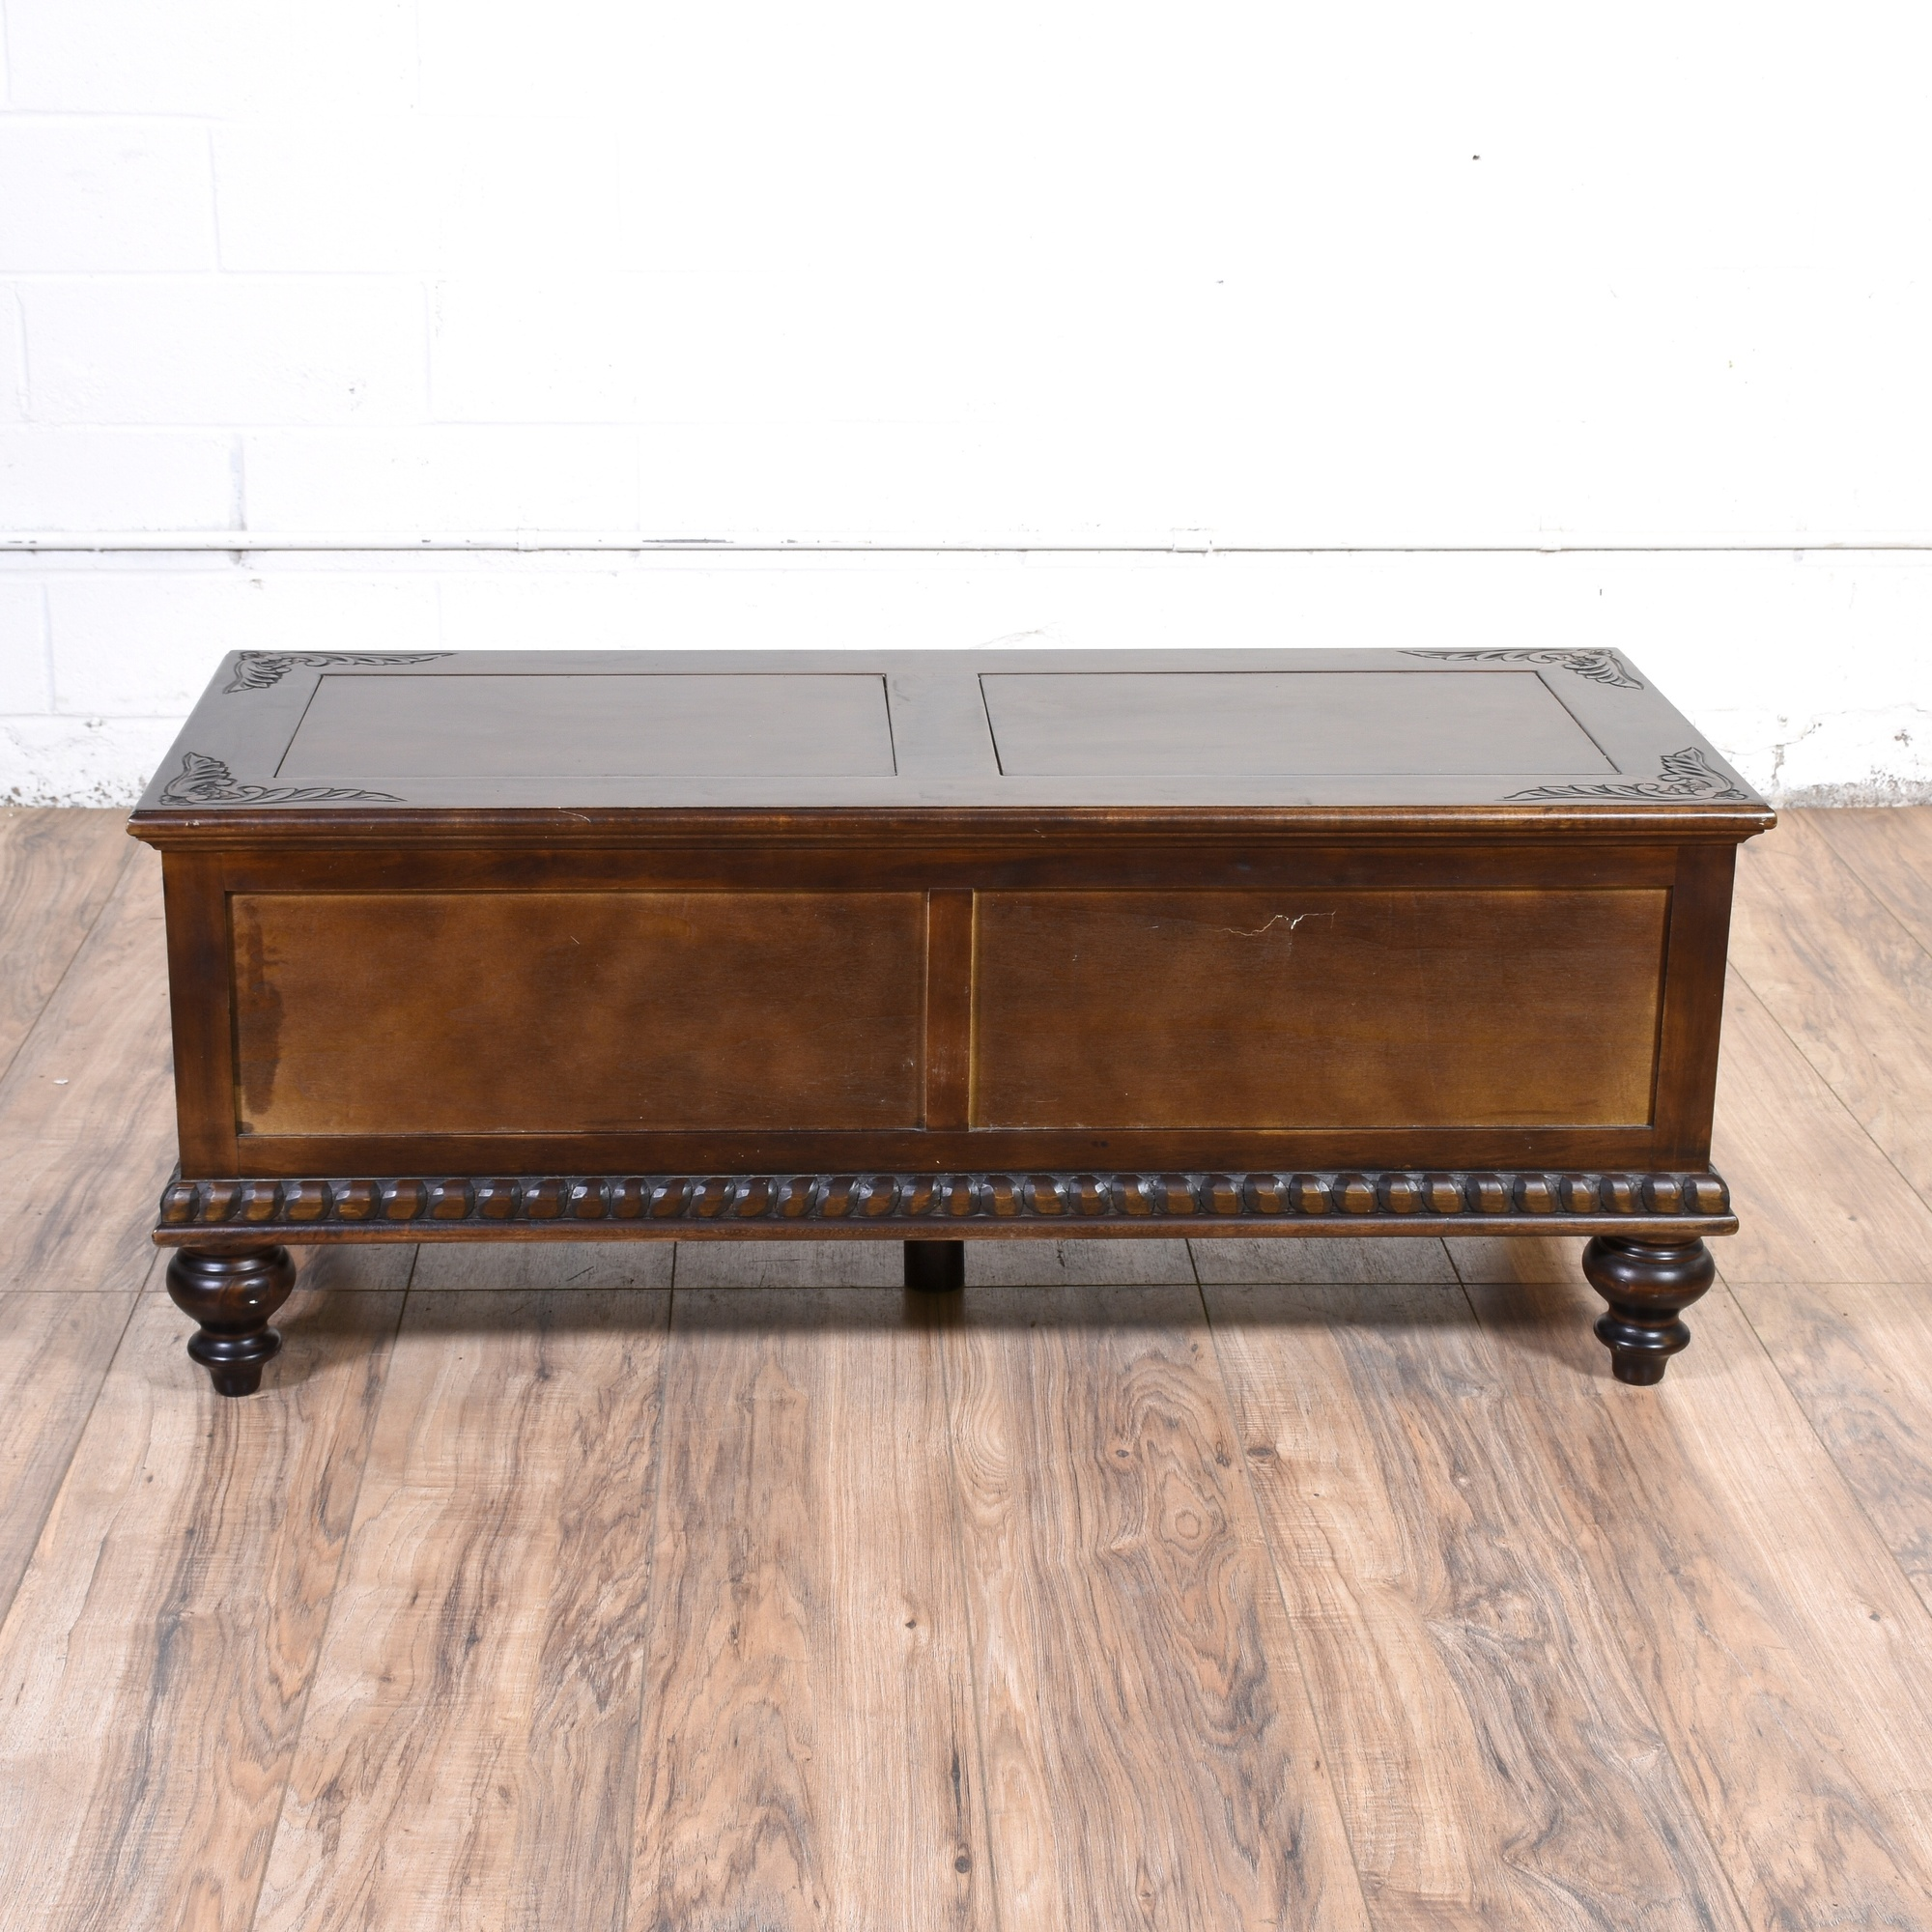 carved dark wood coffee table trunk loveseat vintage With dark wood trunk coffee table